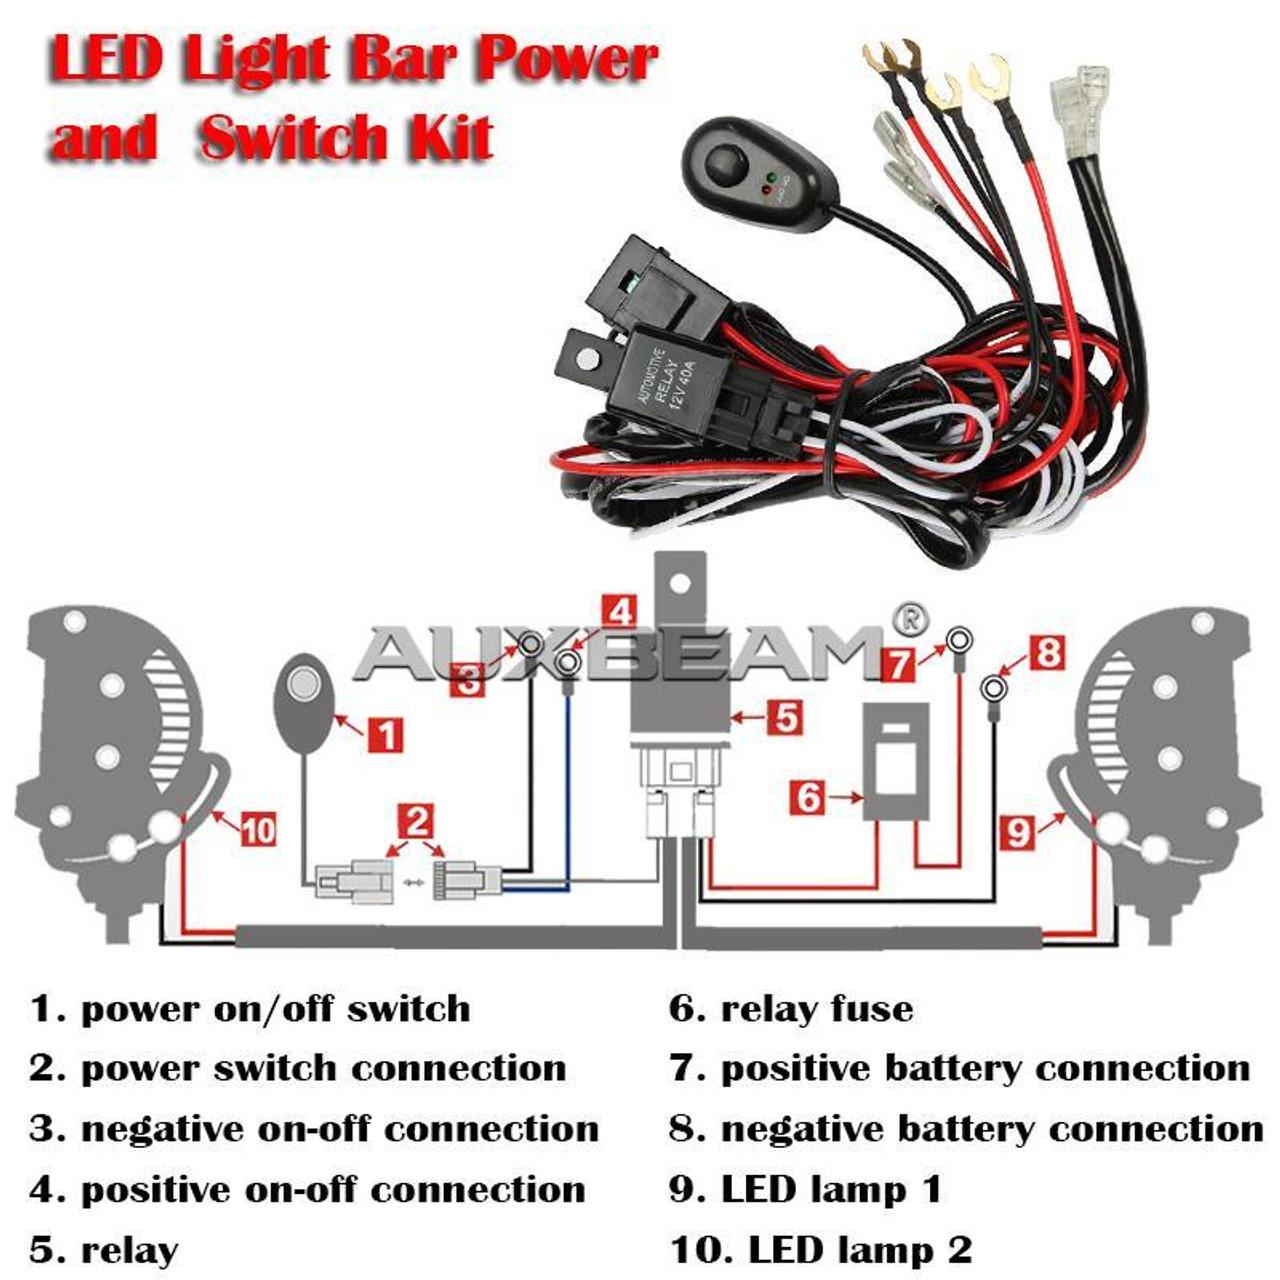 small resolution of 12v 40a led light bar wiring harness kit dual lights 12v 40a led light bar